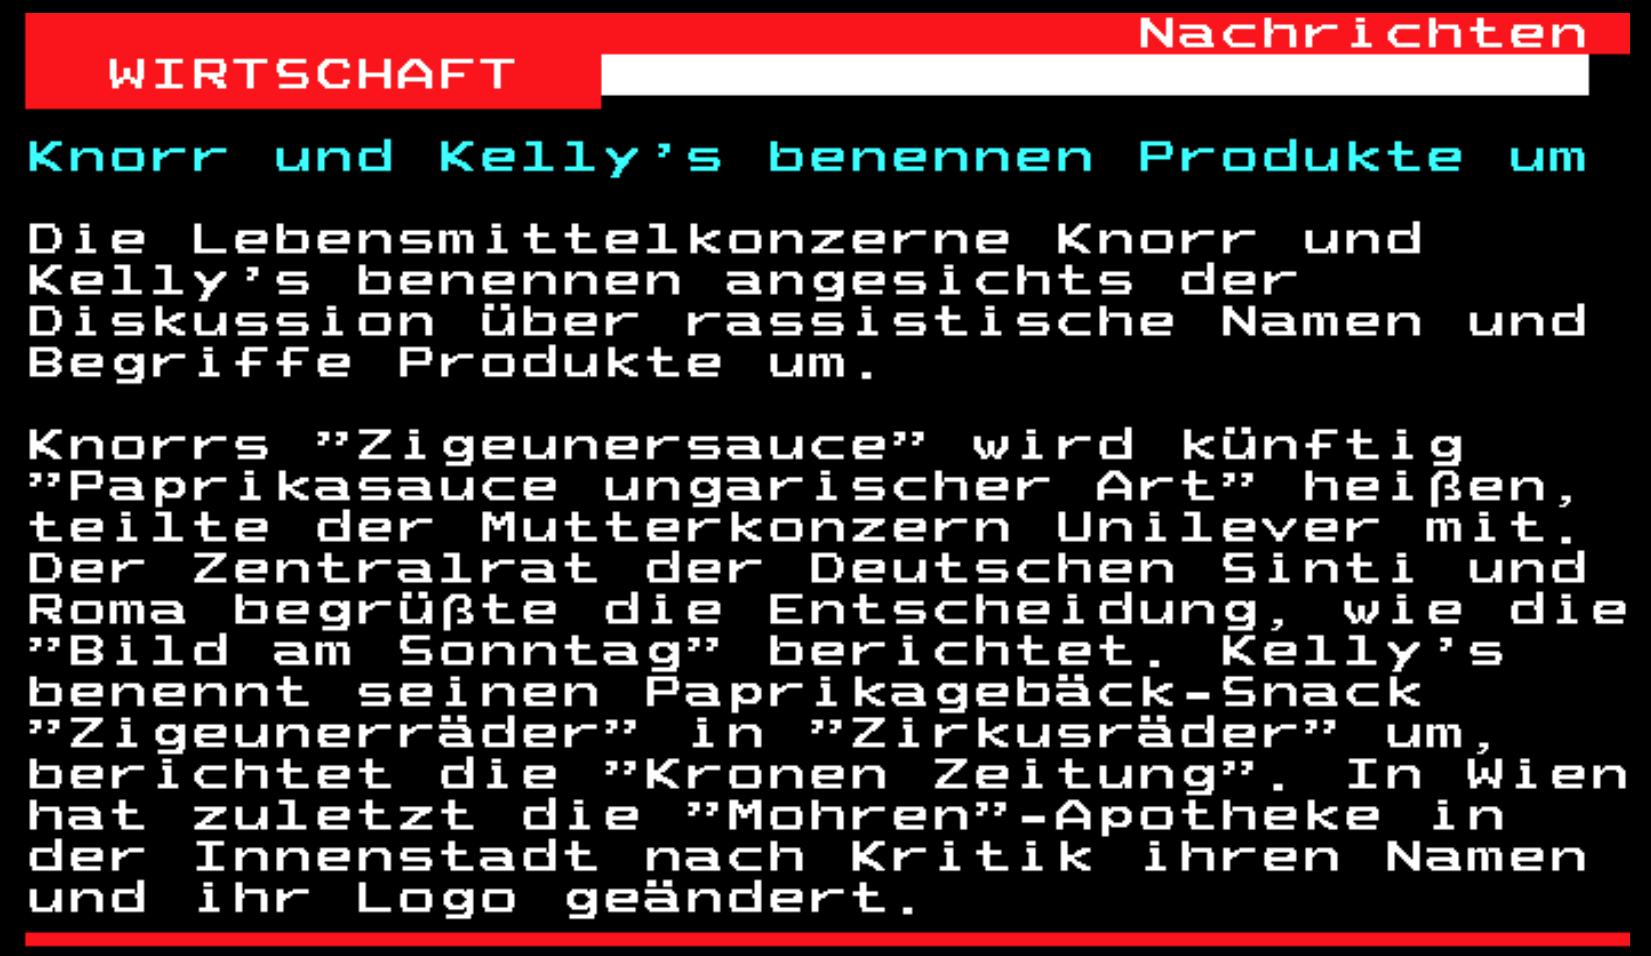 ORF Teletext, 16.8.2020